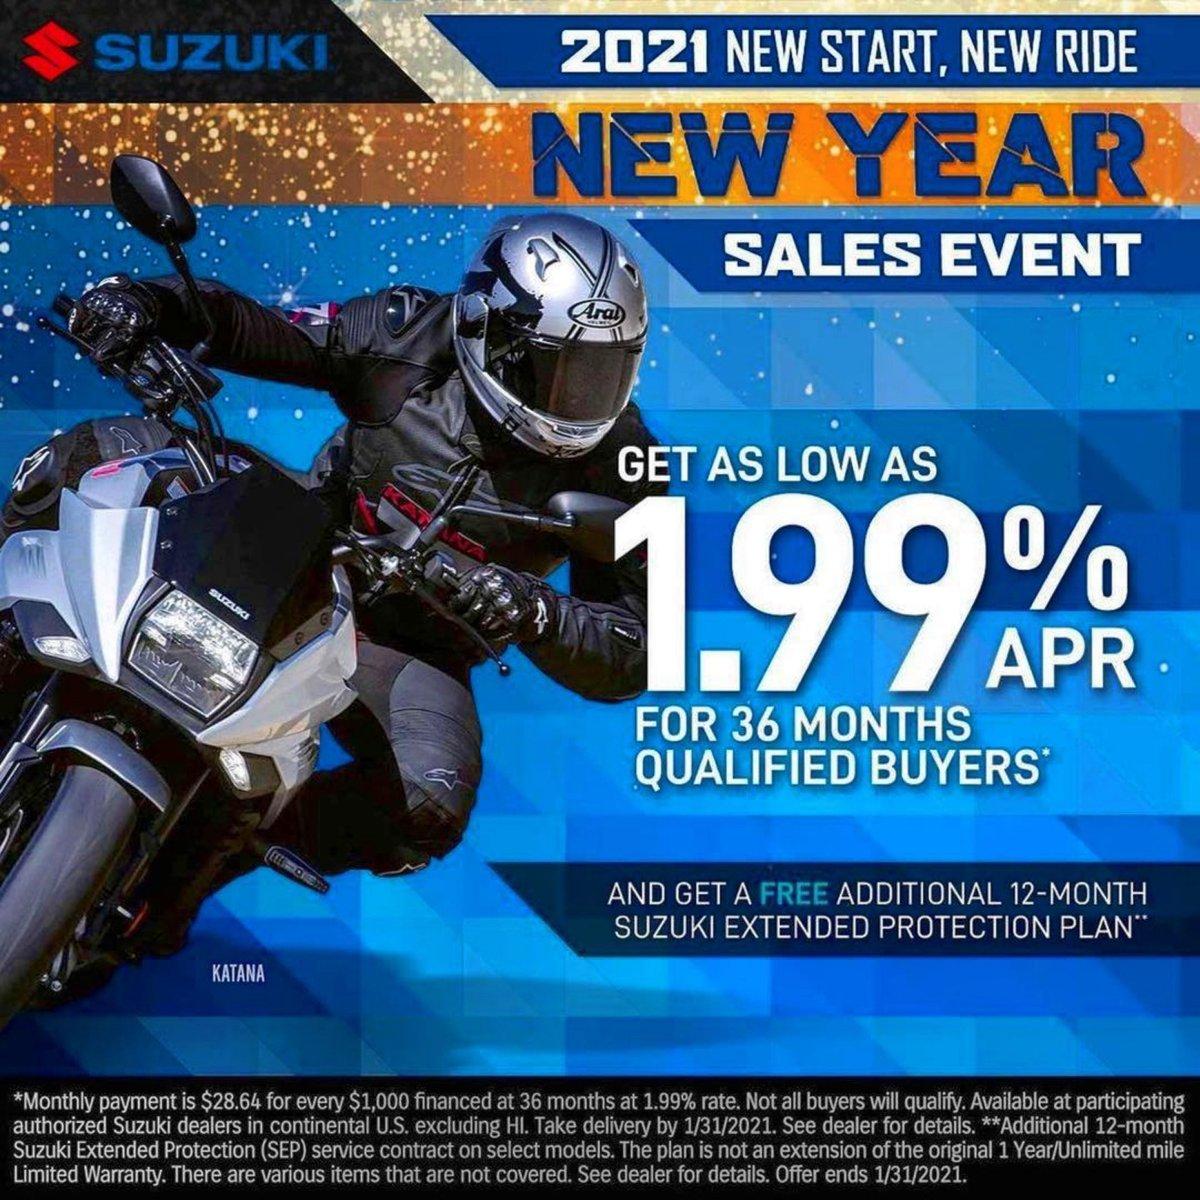 2021 New Start, New Ride - Suzuki New Year Sales Event  Head to your local Suzuki dealer today or go to  to learn more.  #Suzuki #SuzukiCycles #HappyNewYear #Sale #SalesEvent #Motorcycle #Katana